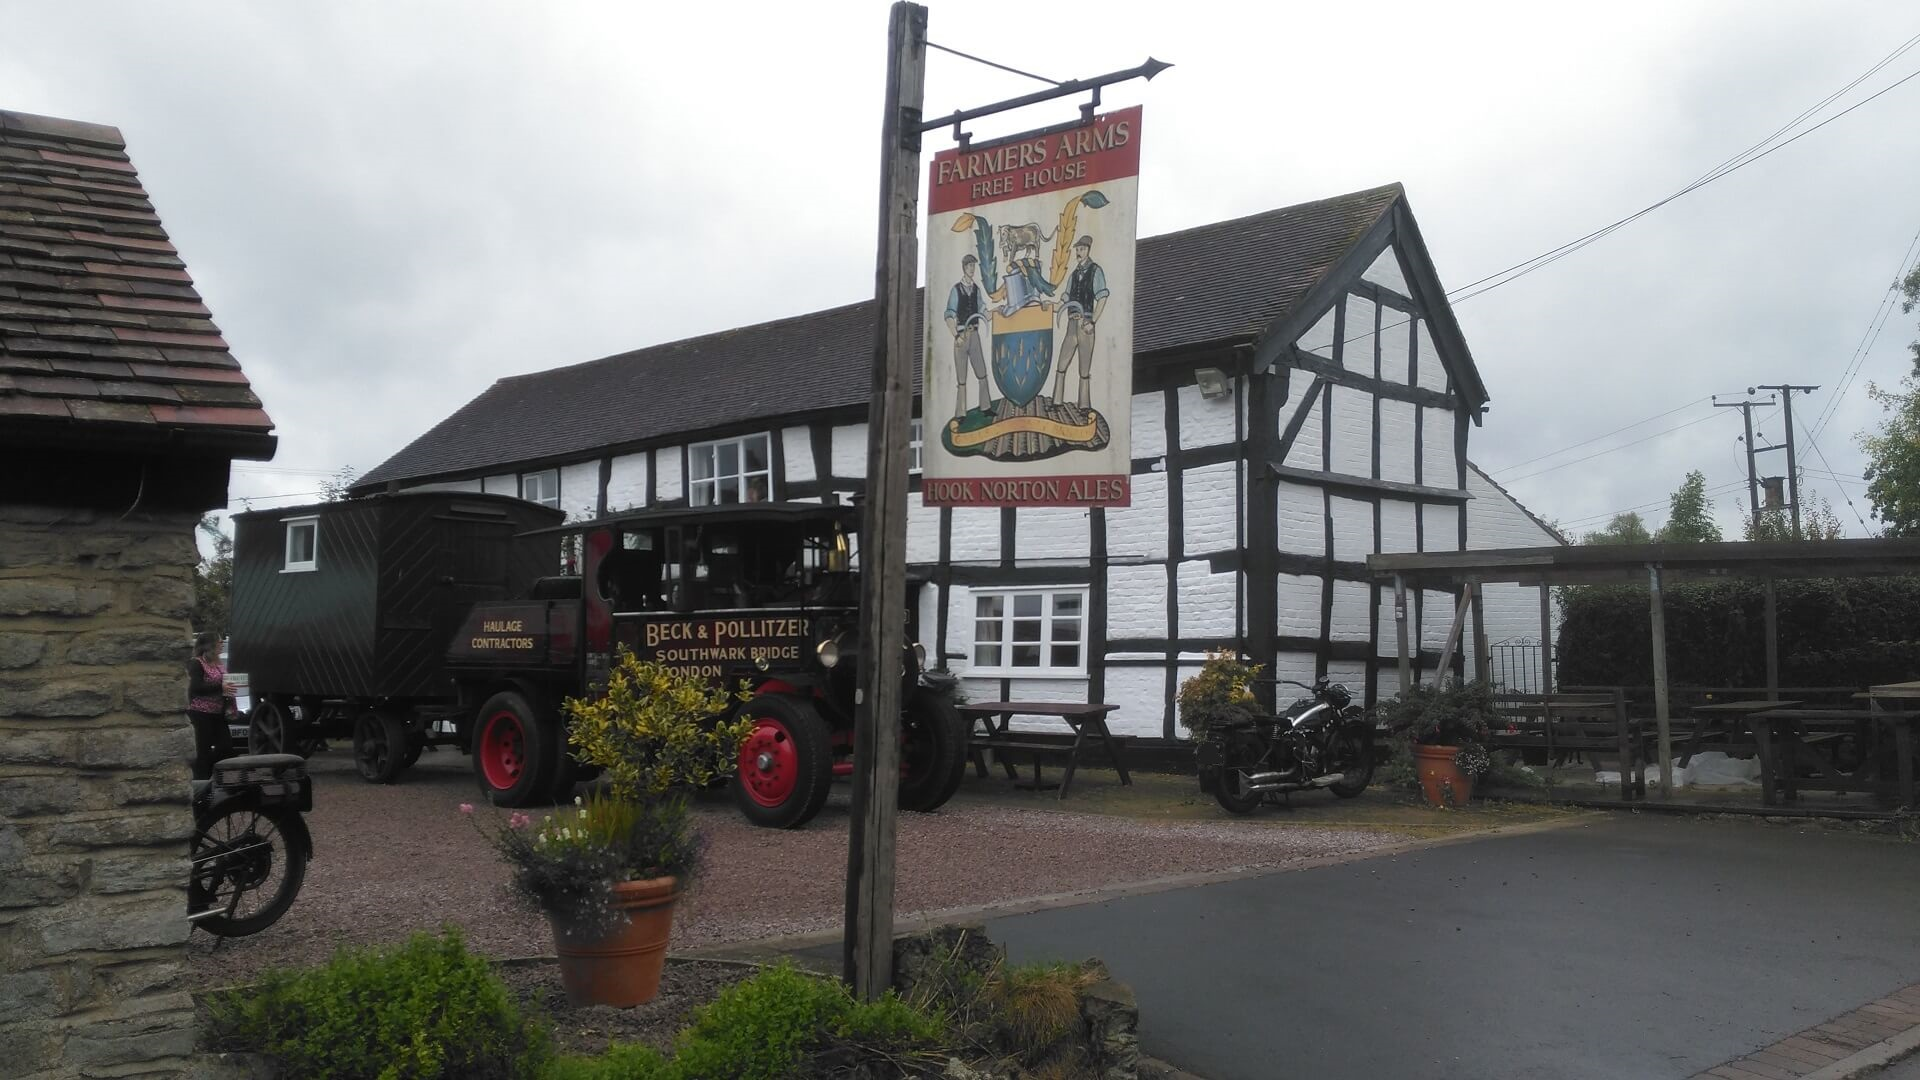 Farmers Arms Birtsmorton 1